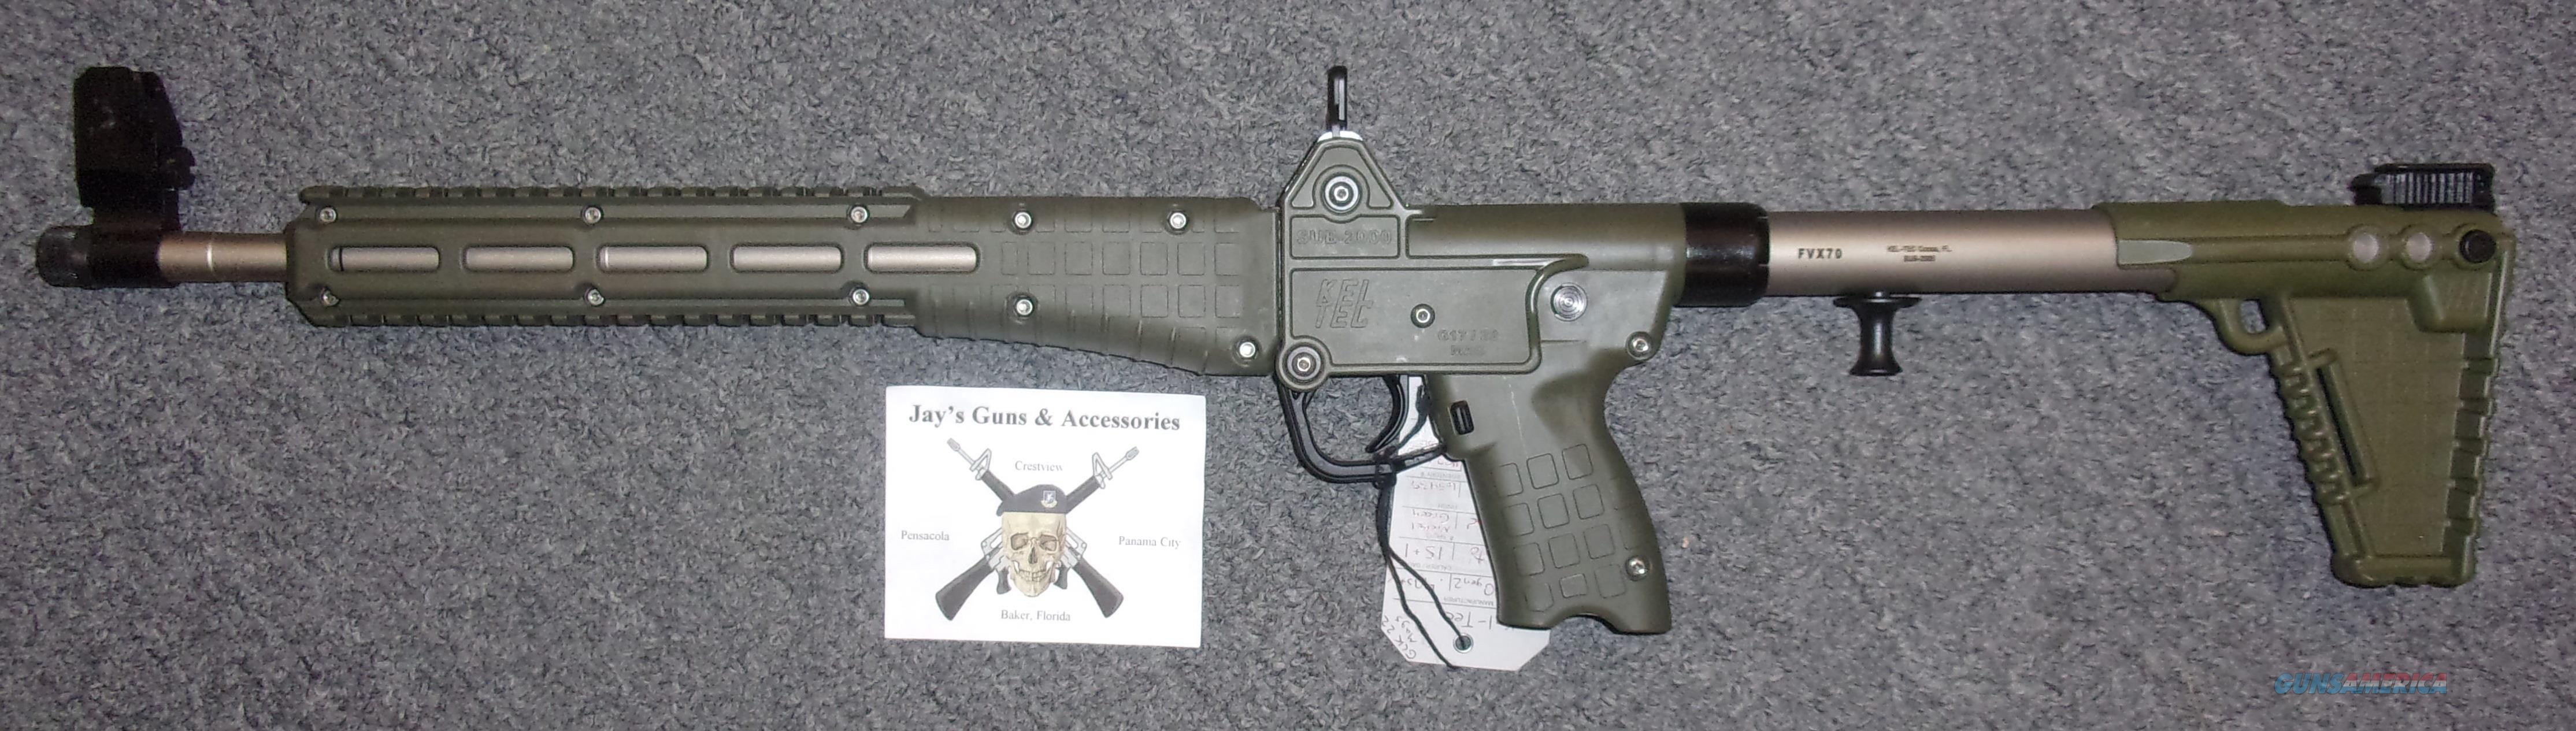 Kel-Tec Sub-2000 Gen 2 Uses Glock 22 Magazines  Guns > Rifles > Kel-Tec Rifles